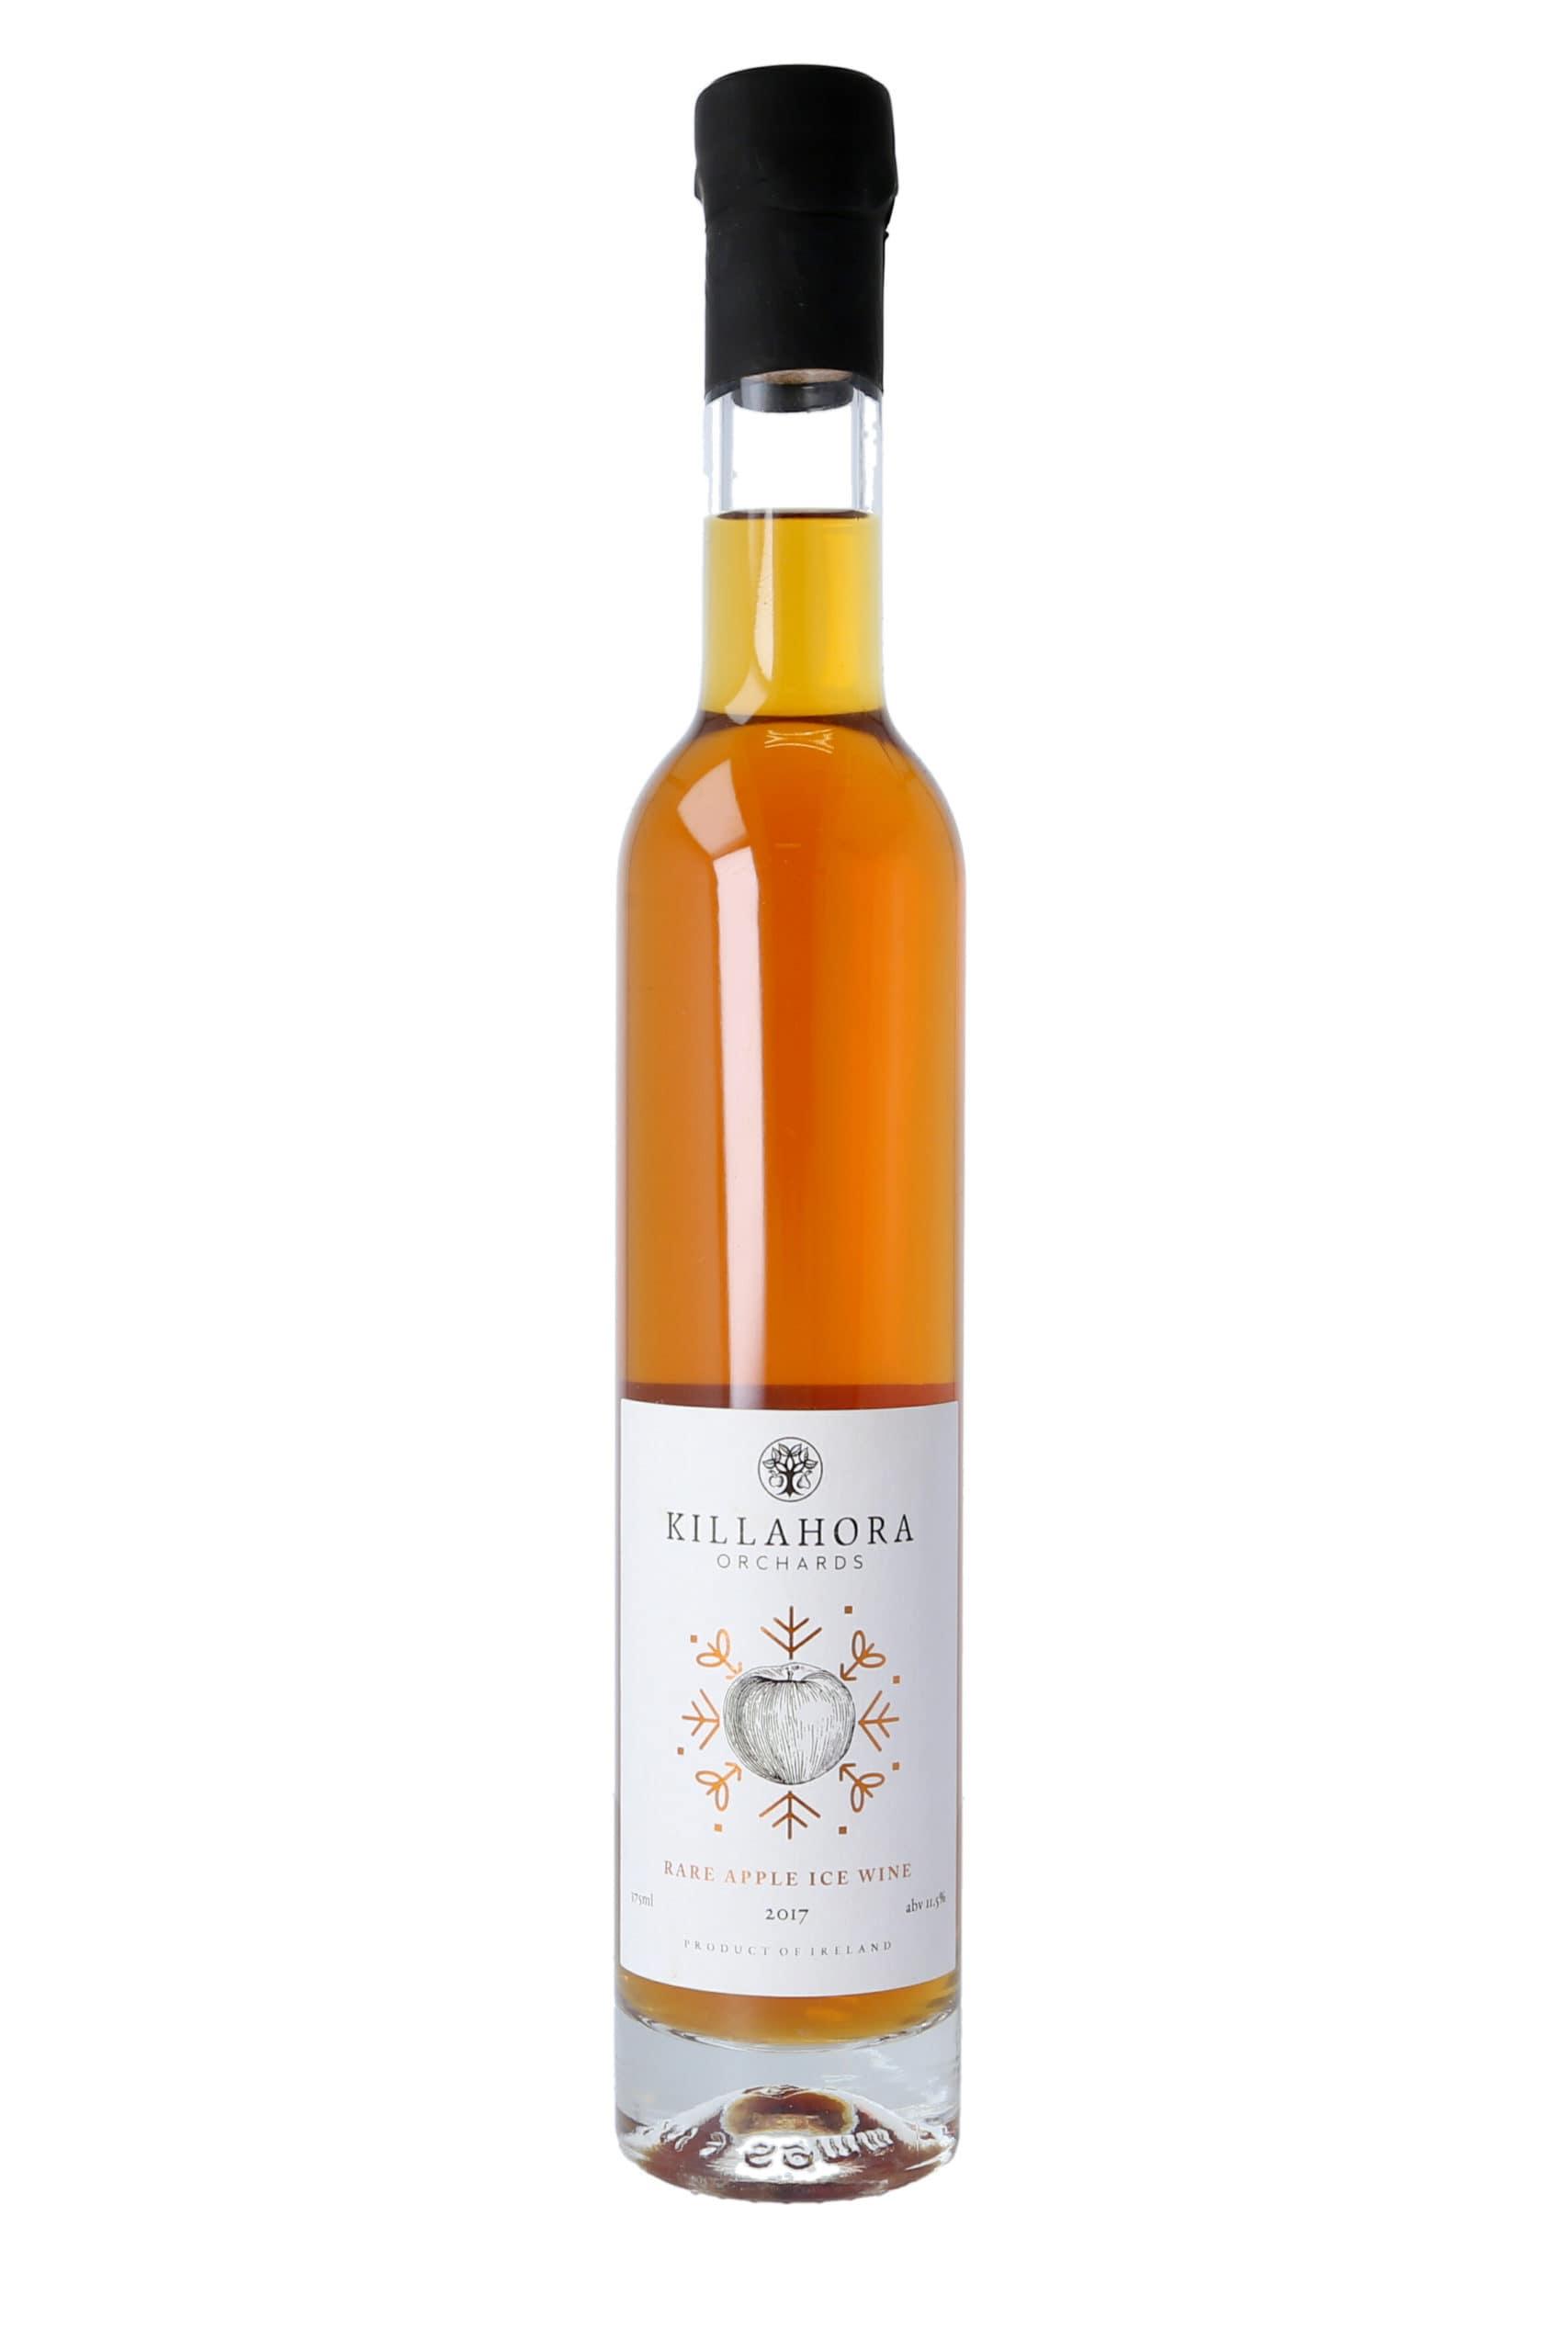 Killahora Orchards Rare Apple Ice Wine 2018